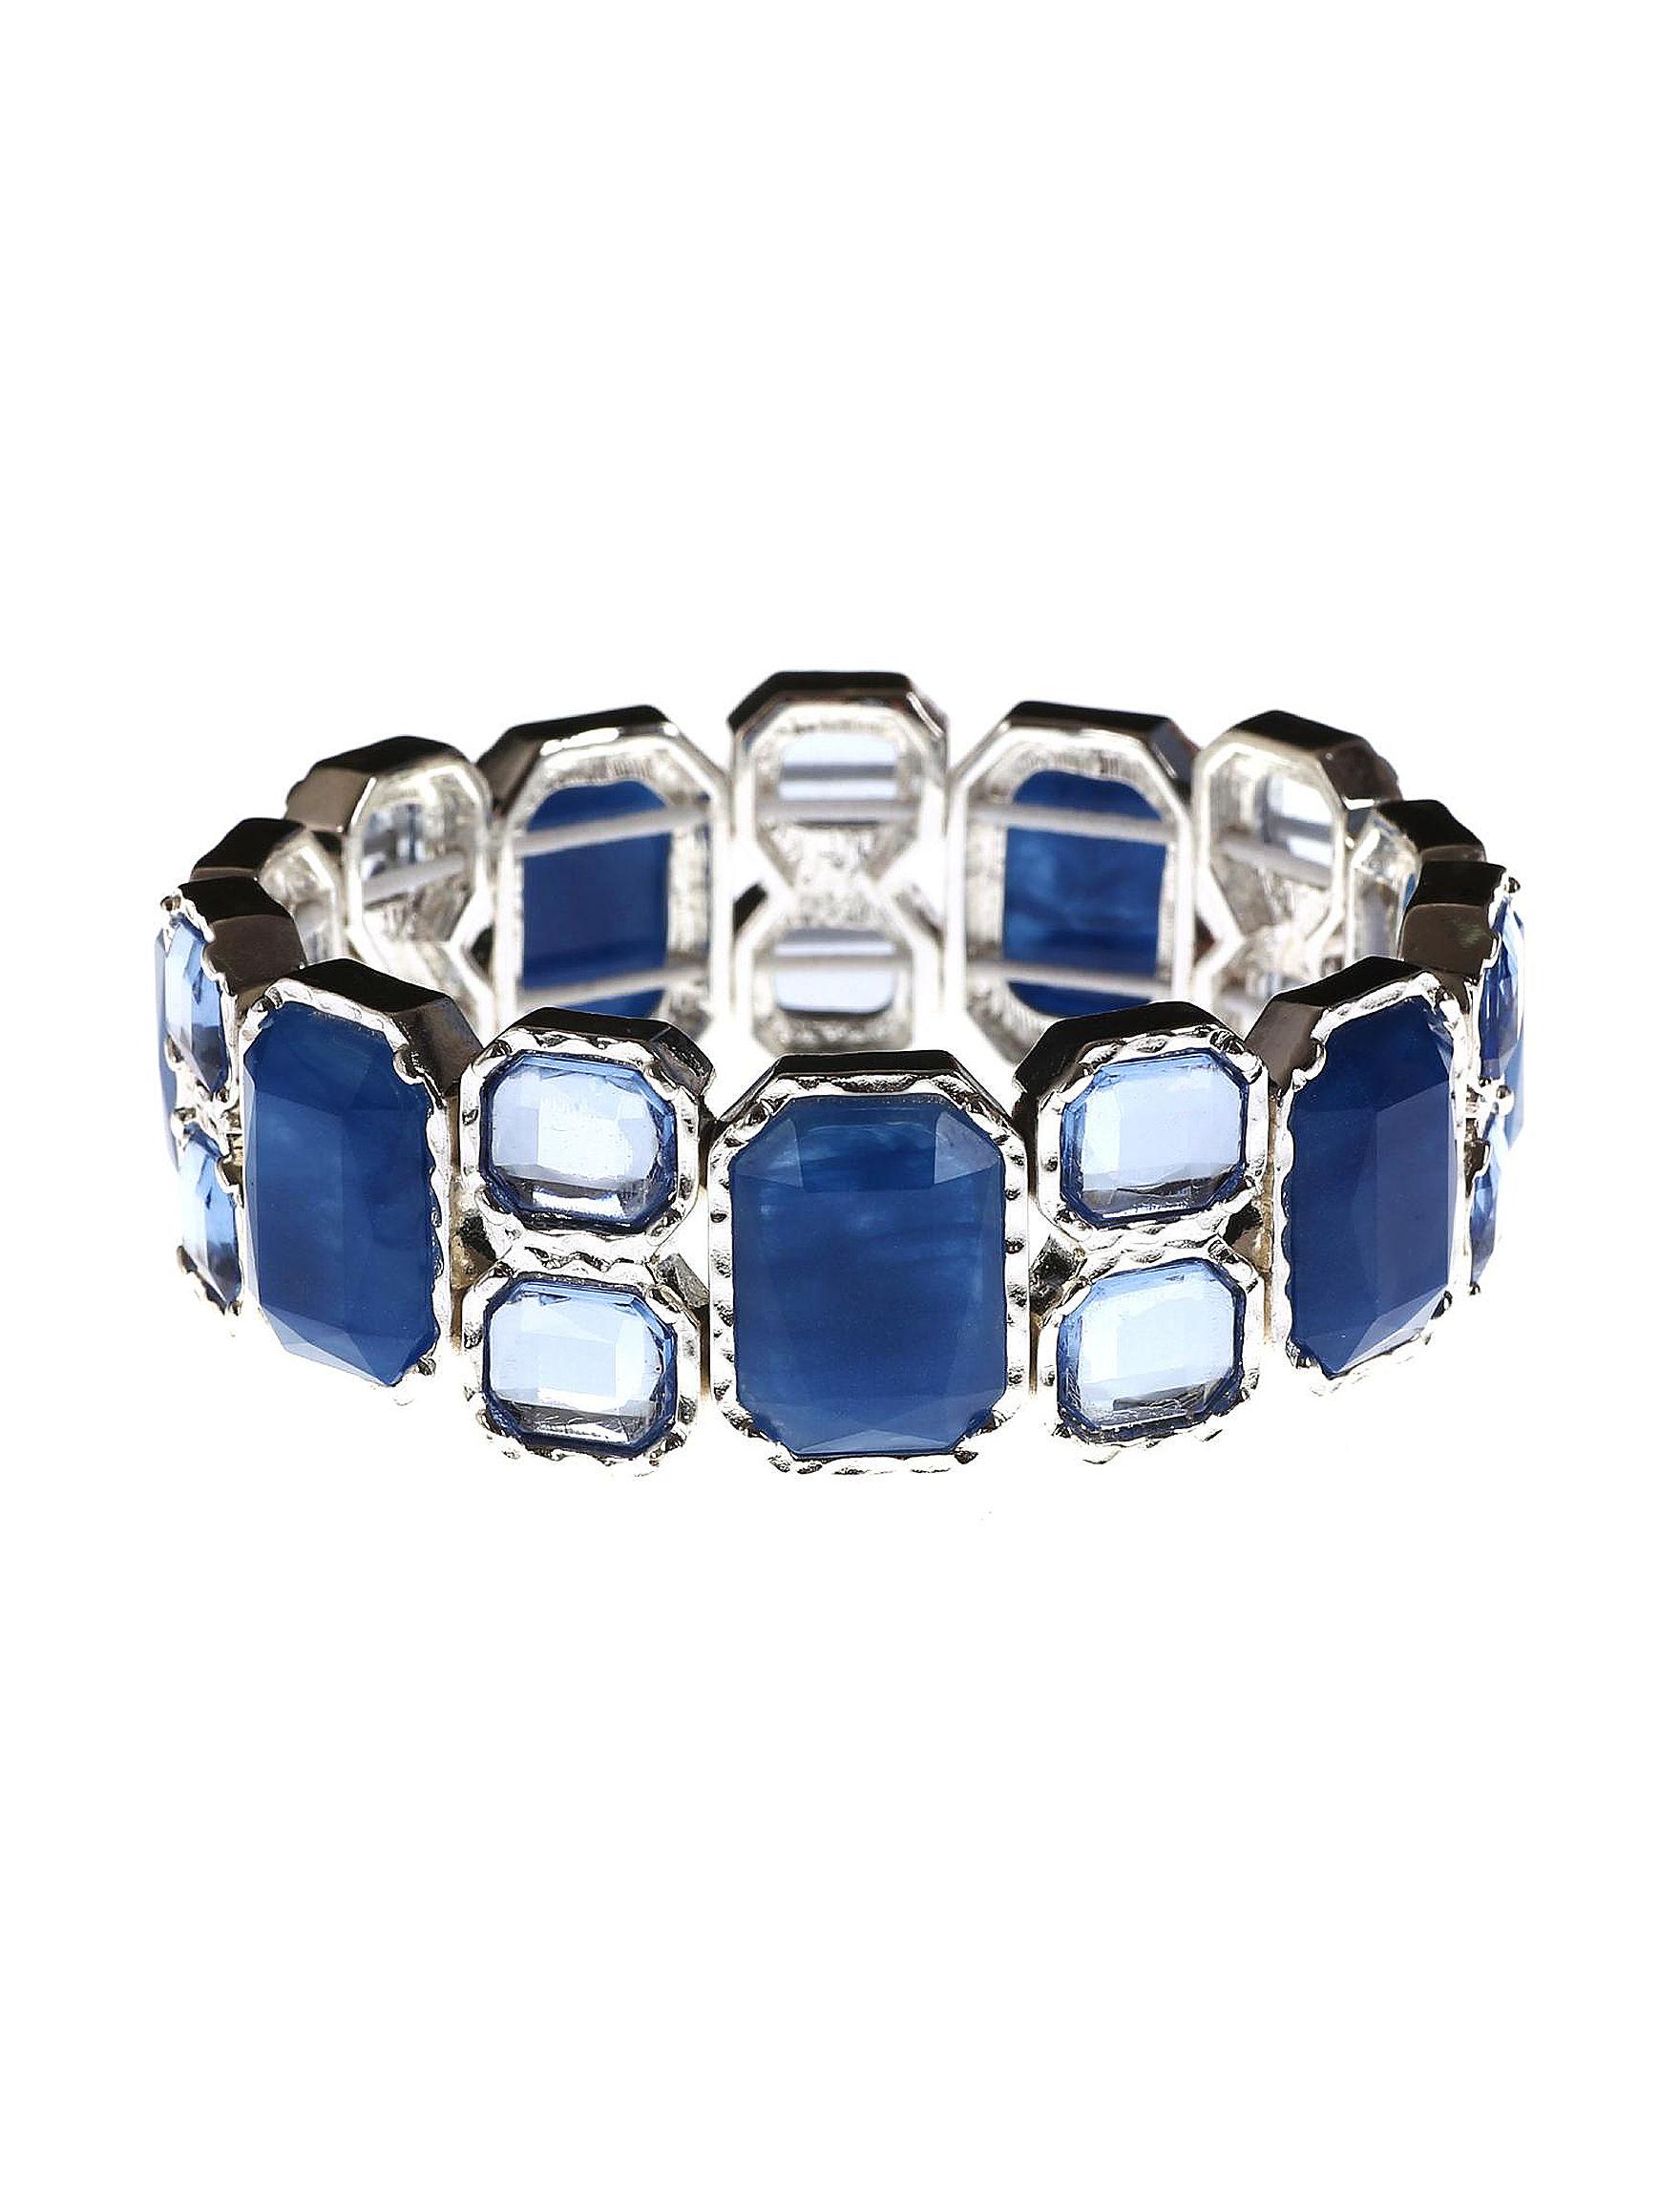 Gloria Vanderbilt Blue Bracelets Fashion Jewelry